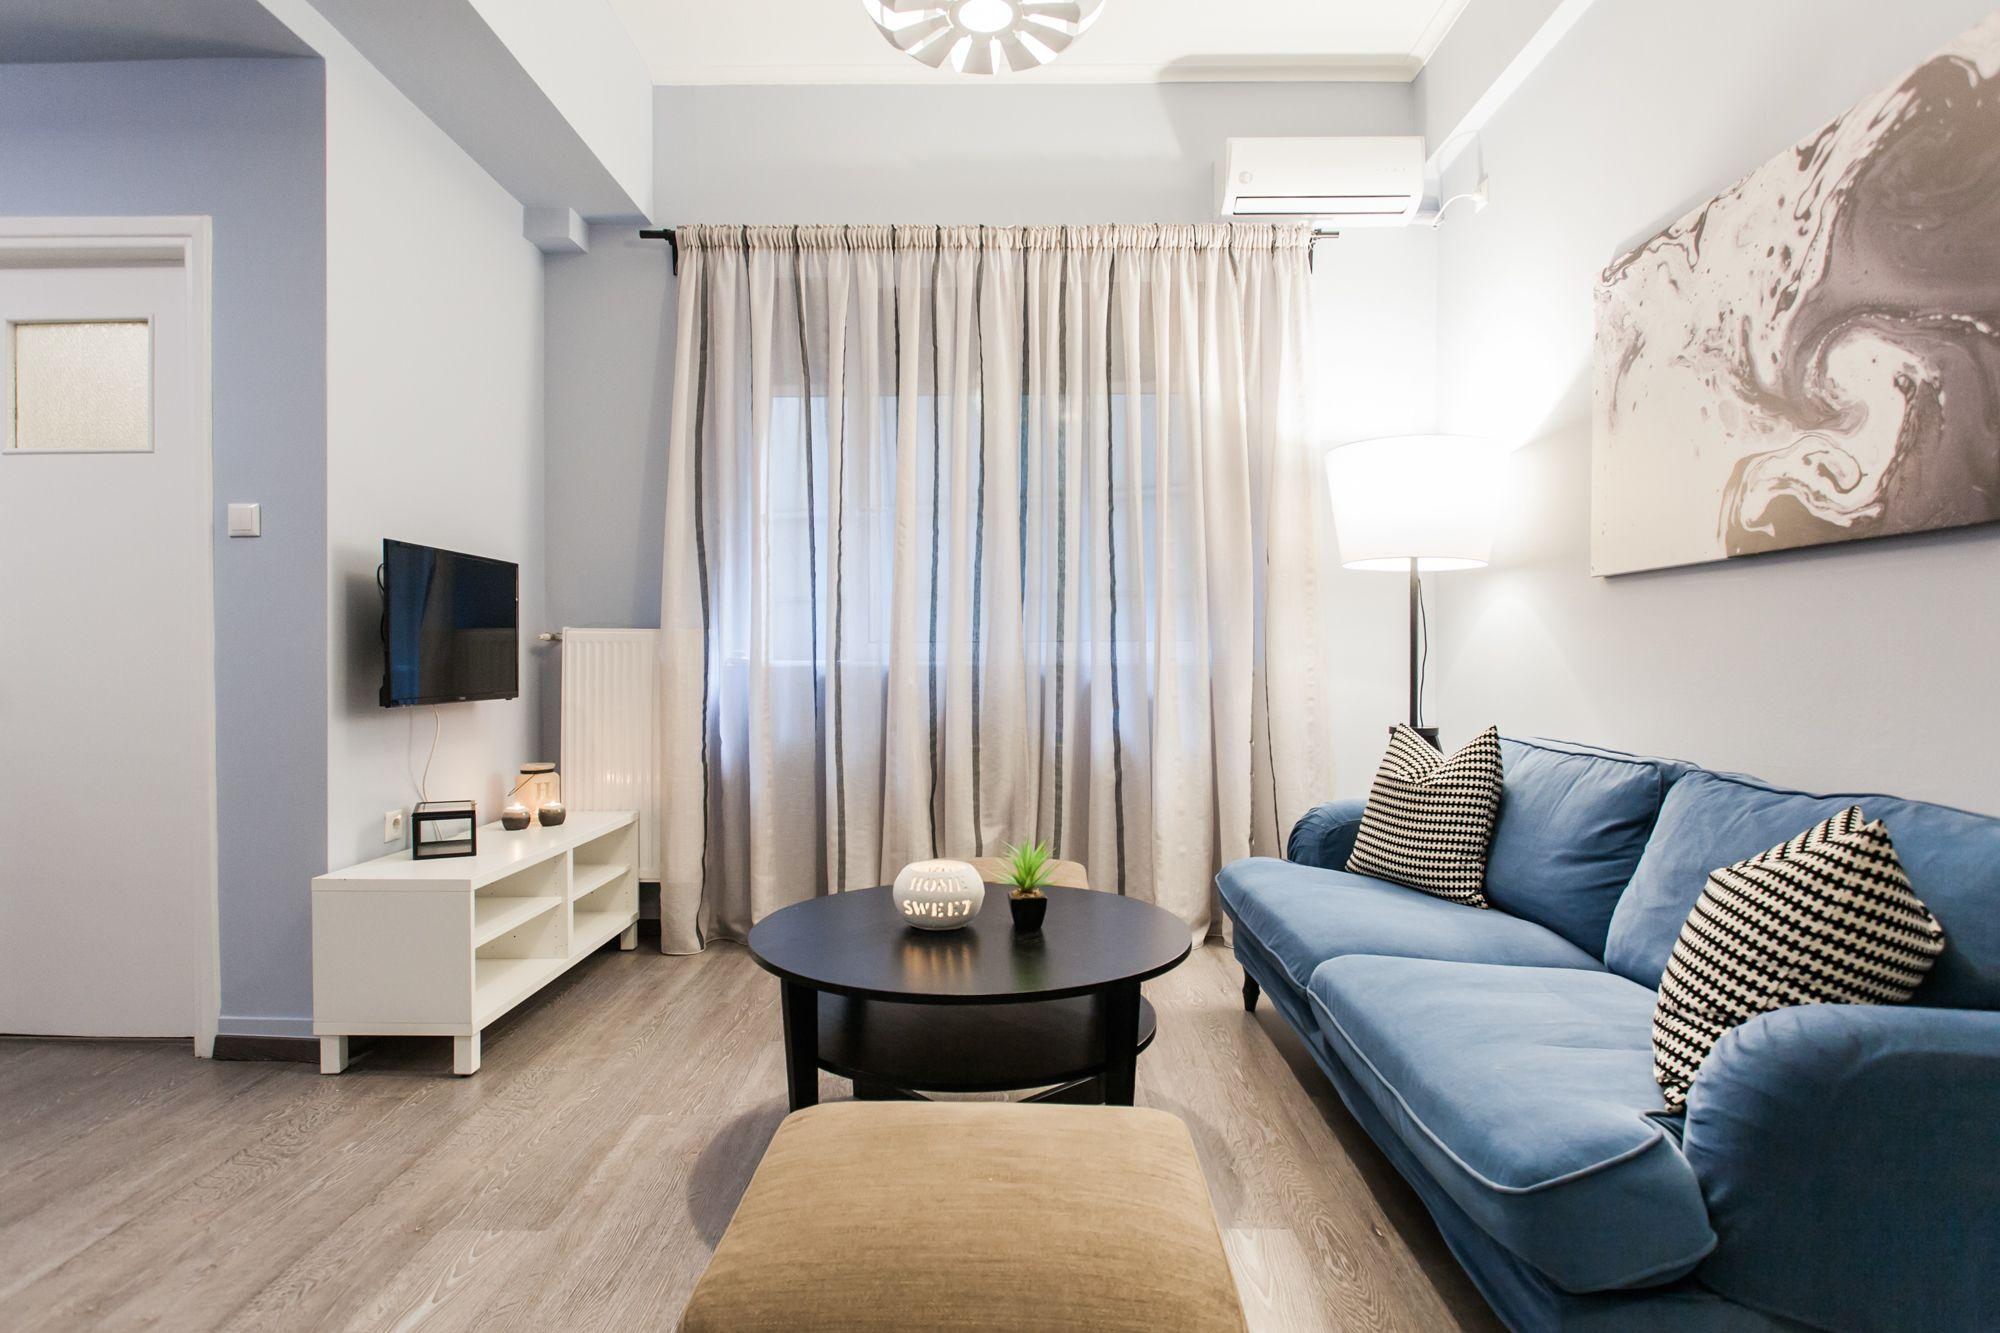 Kolonaki 2 Bedroom Apartment By Livin Urbban